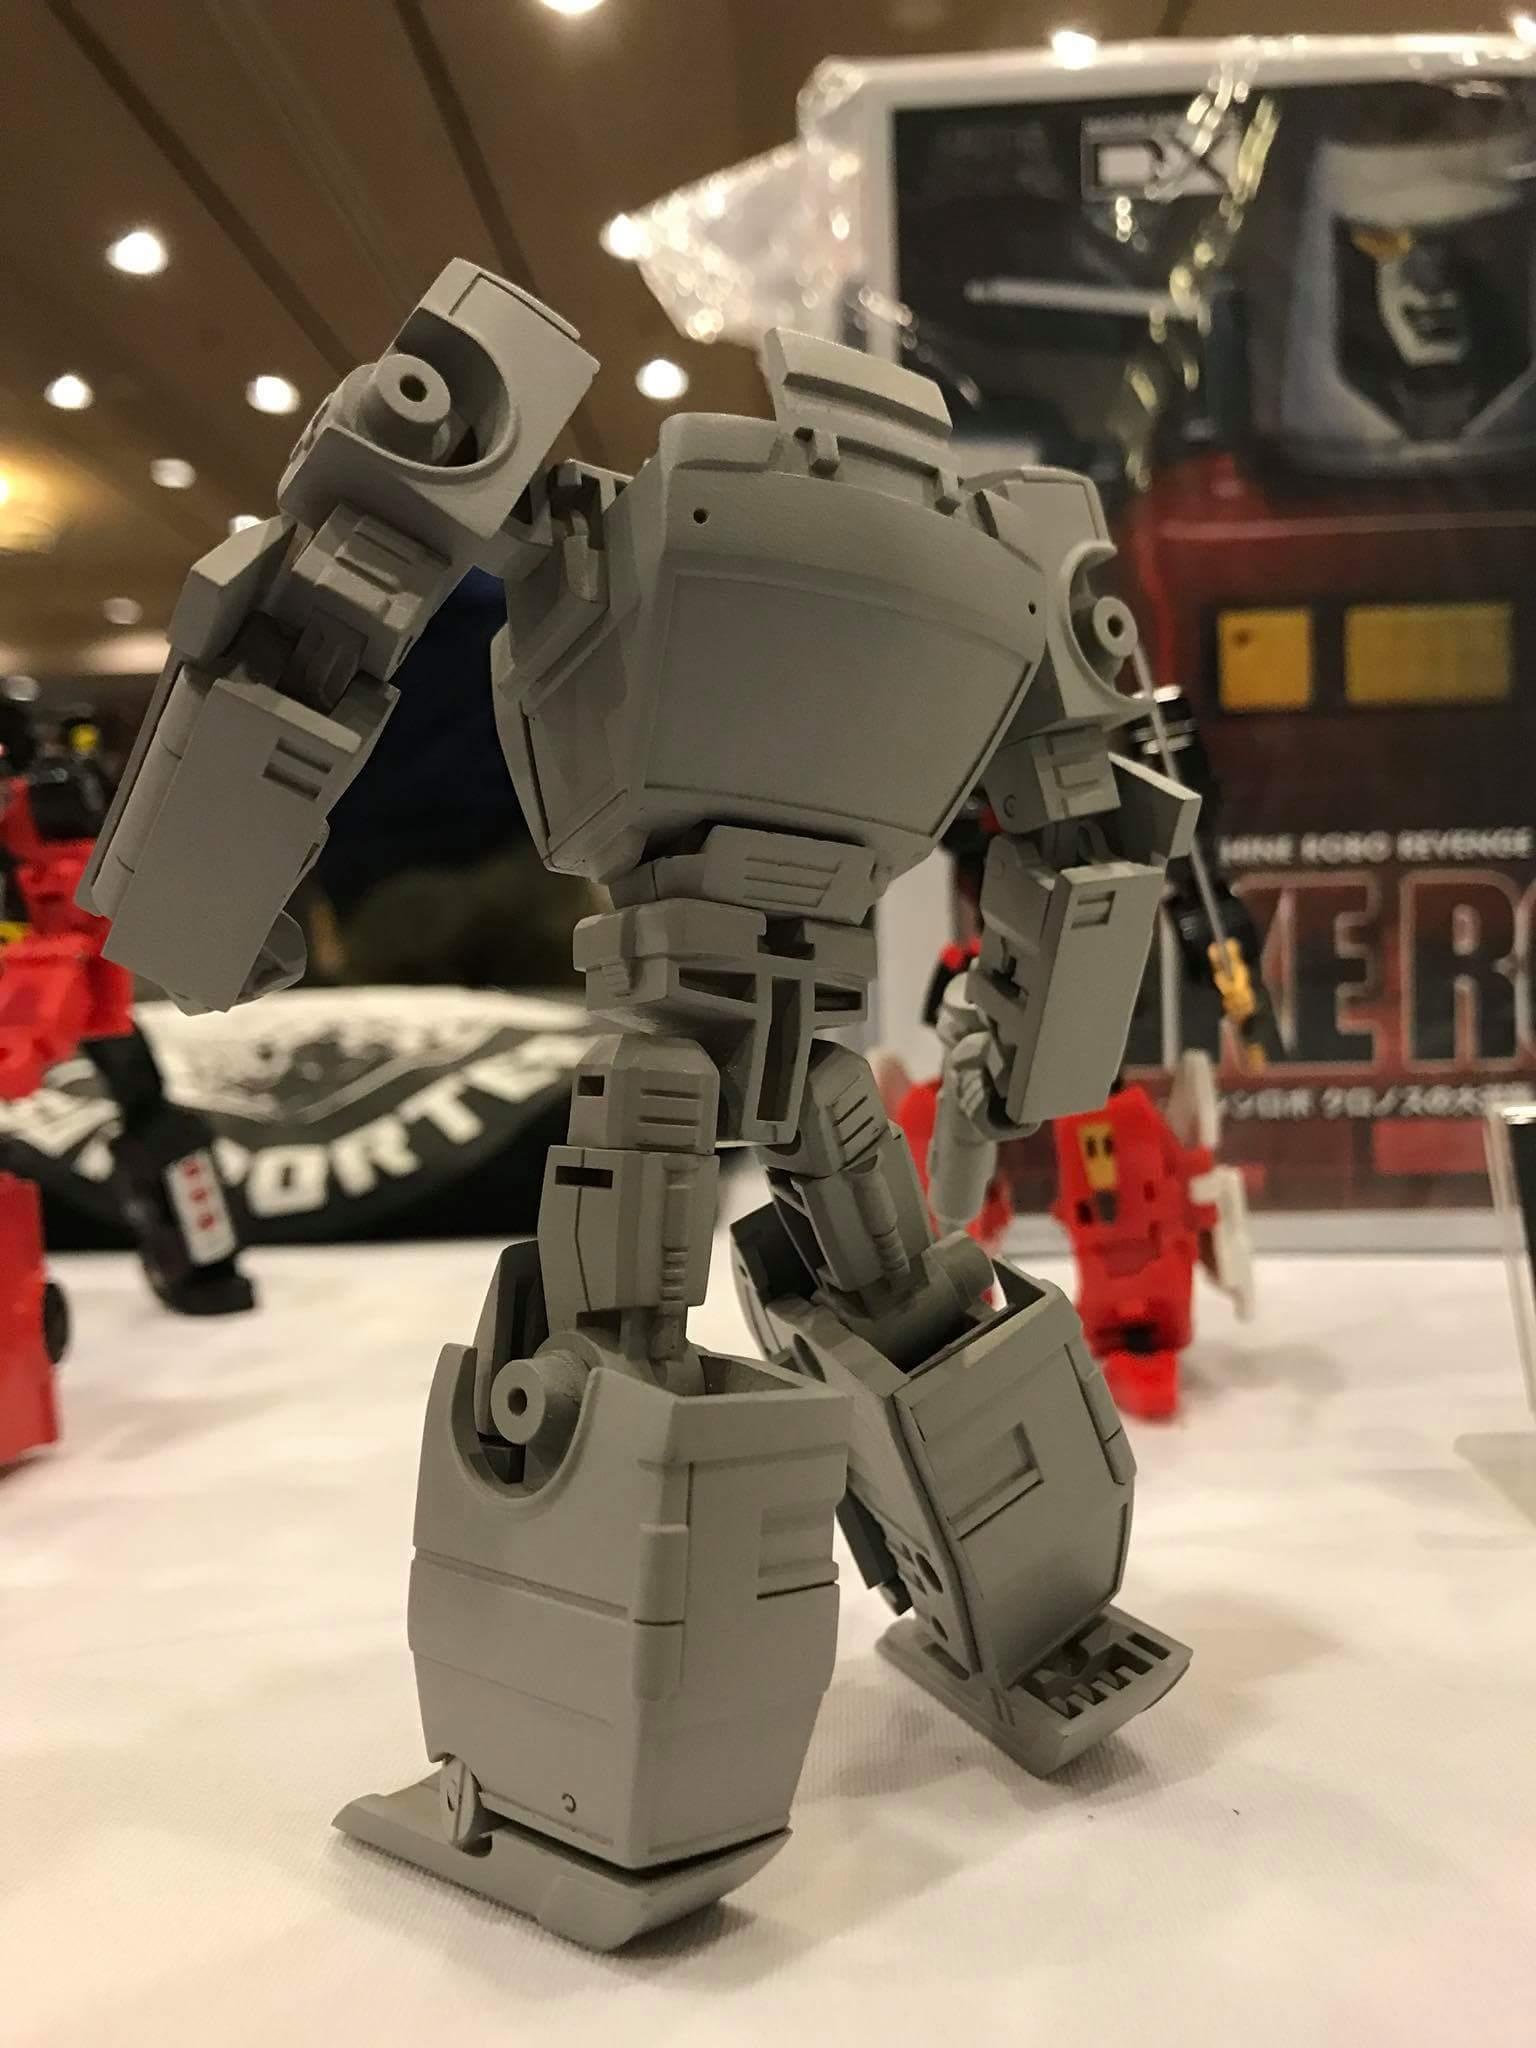 Gobots - Machine Robo ― Dessin Animé + Jouets  - Page 8 BcFYvodY_o